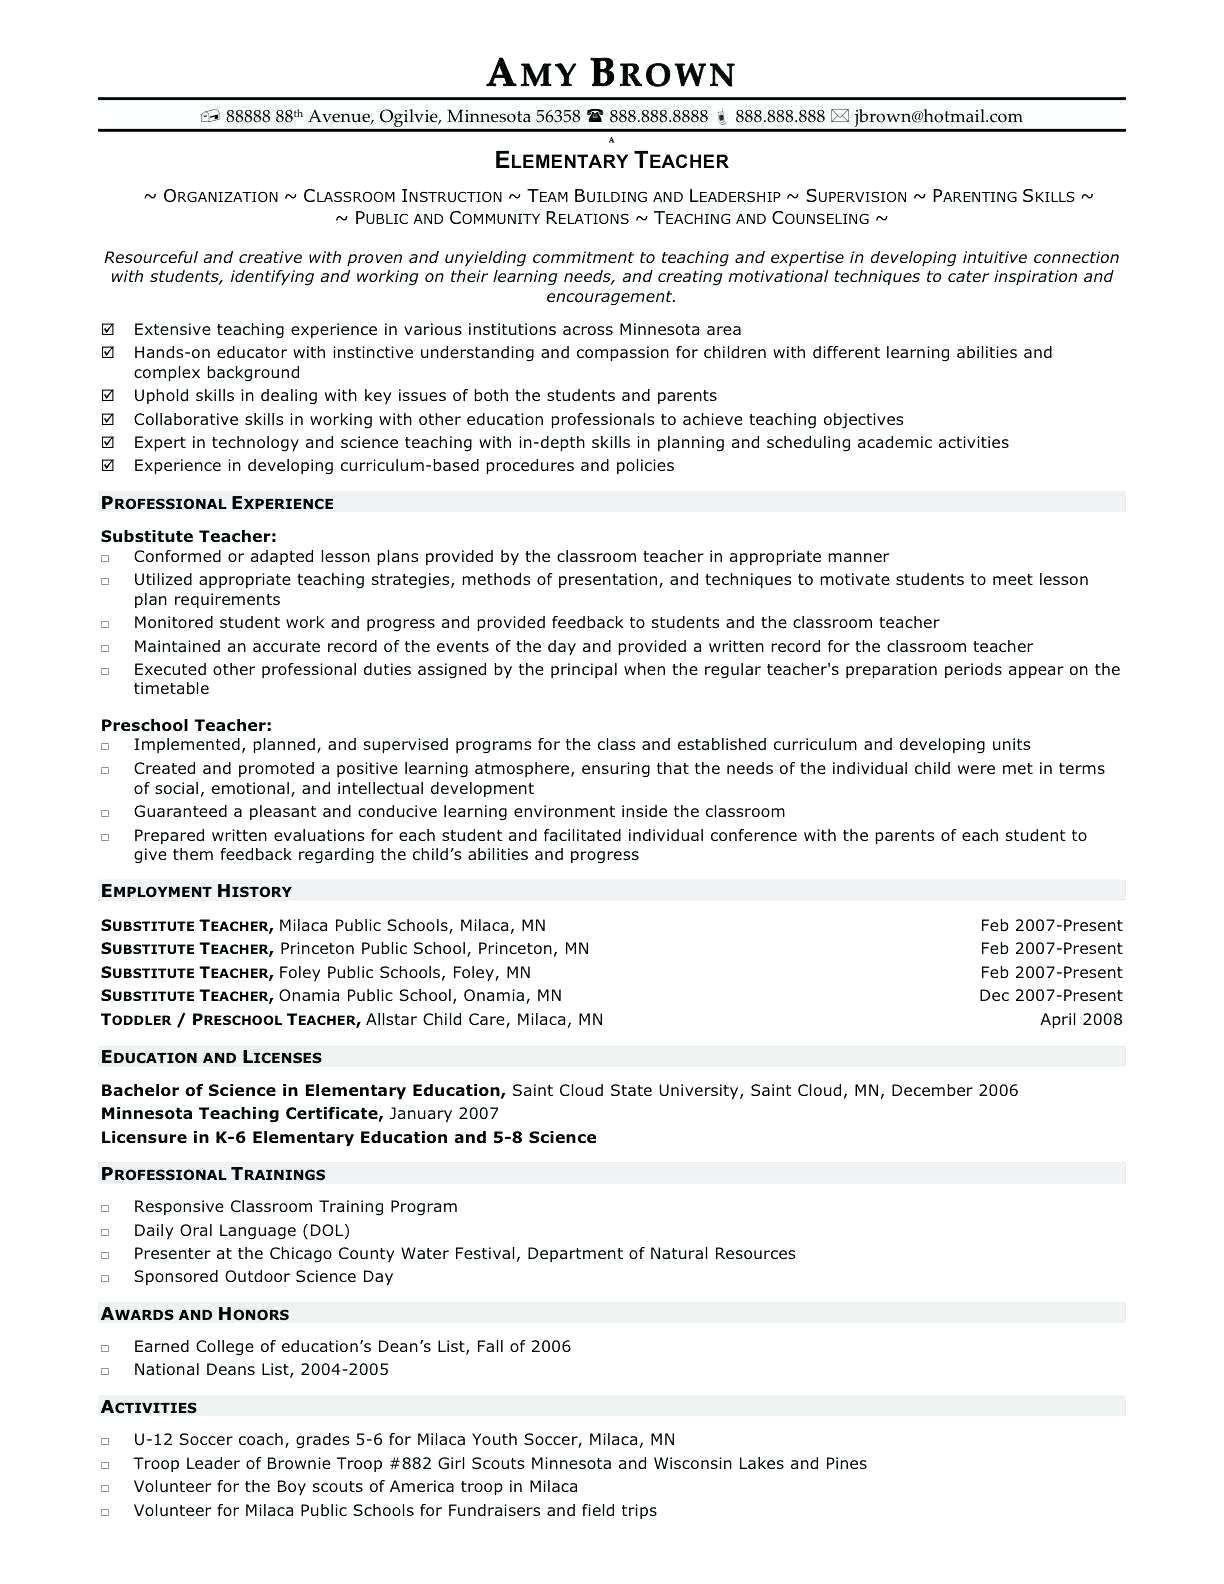 Paraprofessional Job Description For Resume Elegant Teaching Resumes Elementary Teacher Resume Teacher Resume Template Teacher Resume Examples